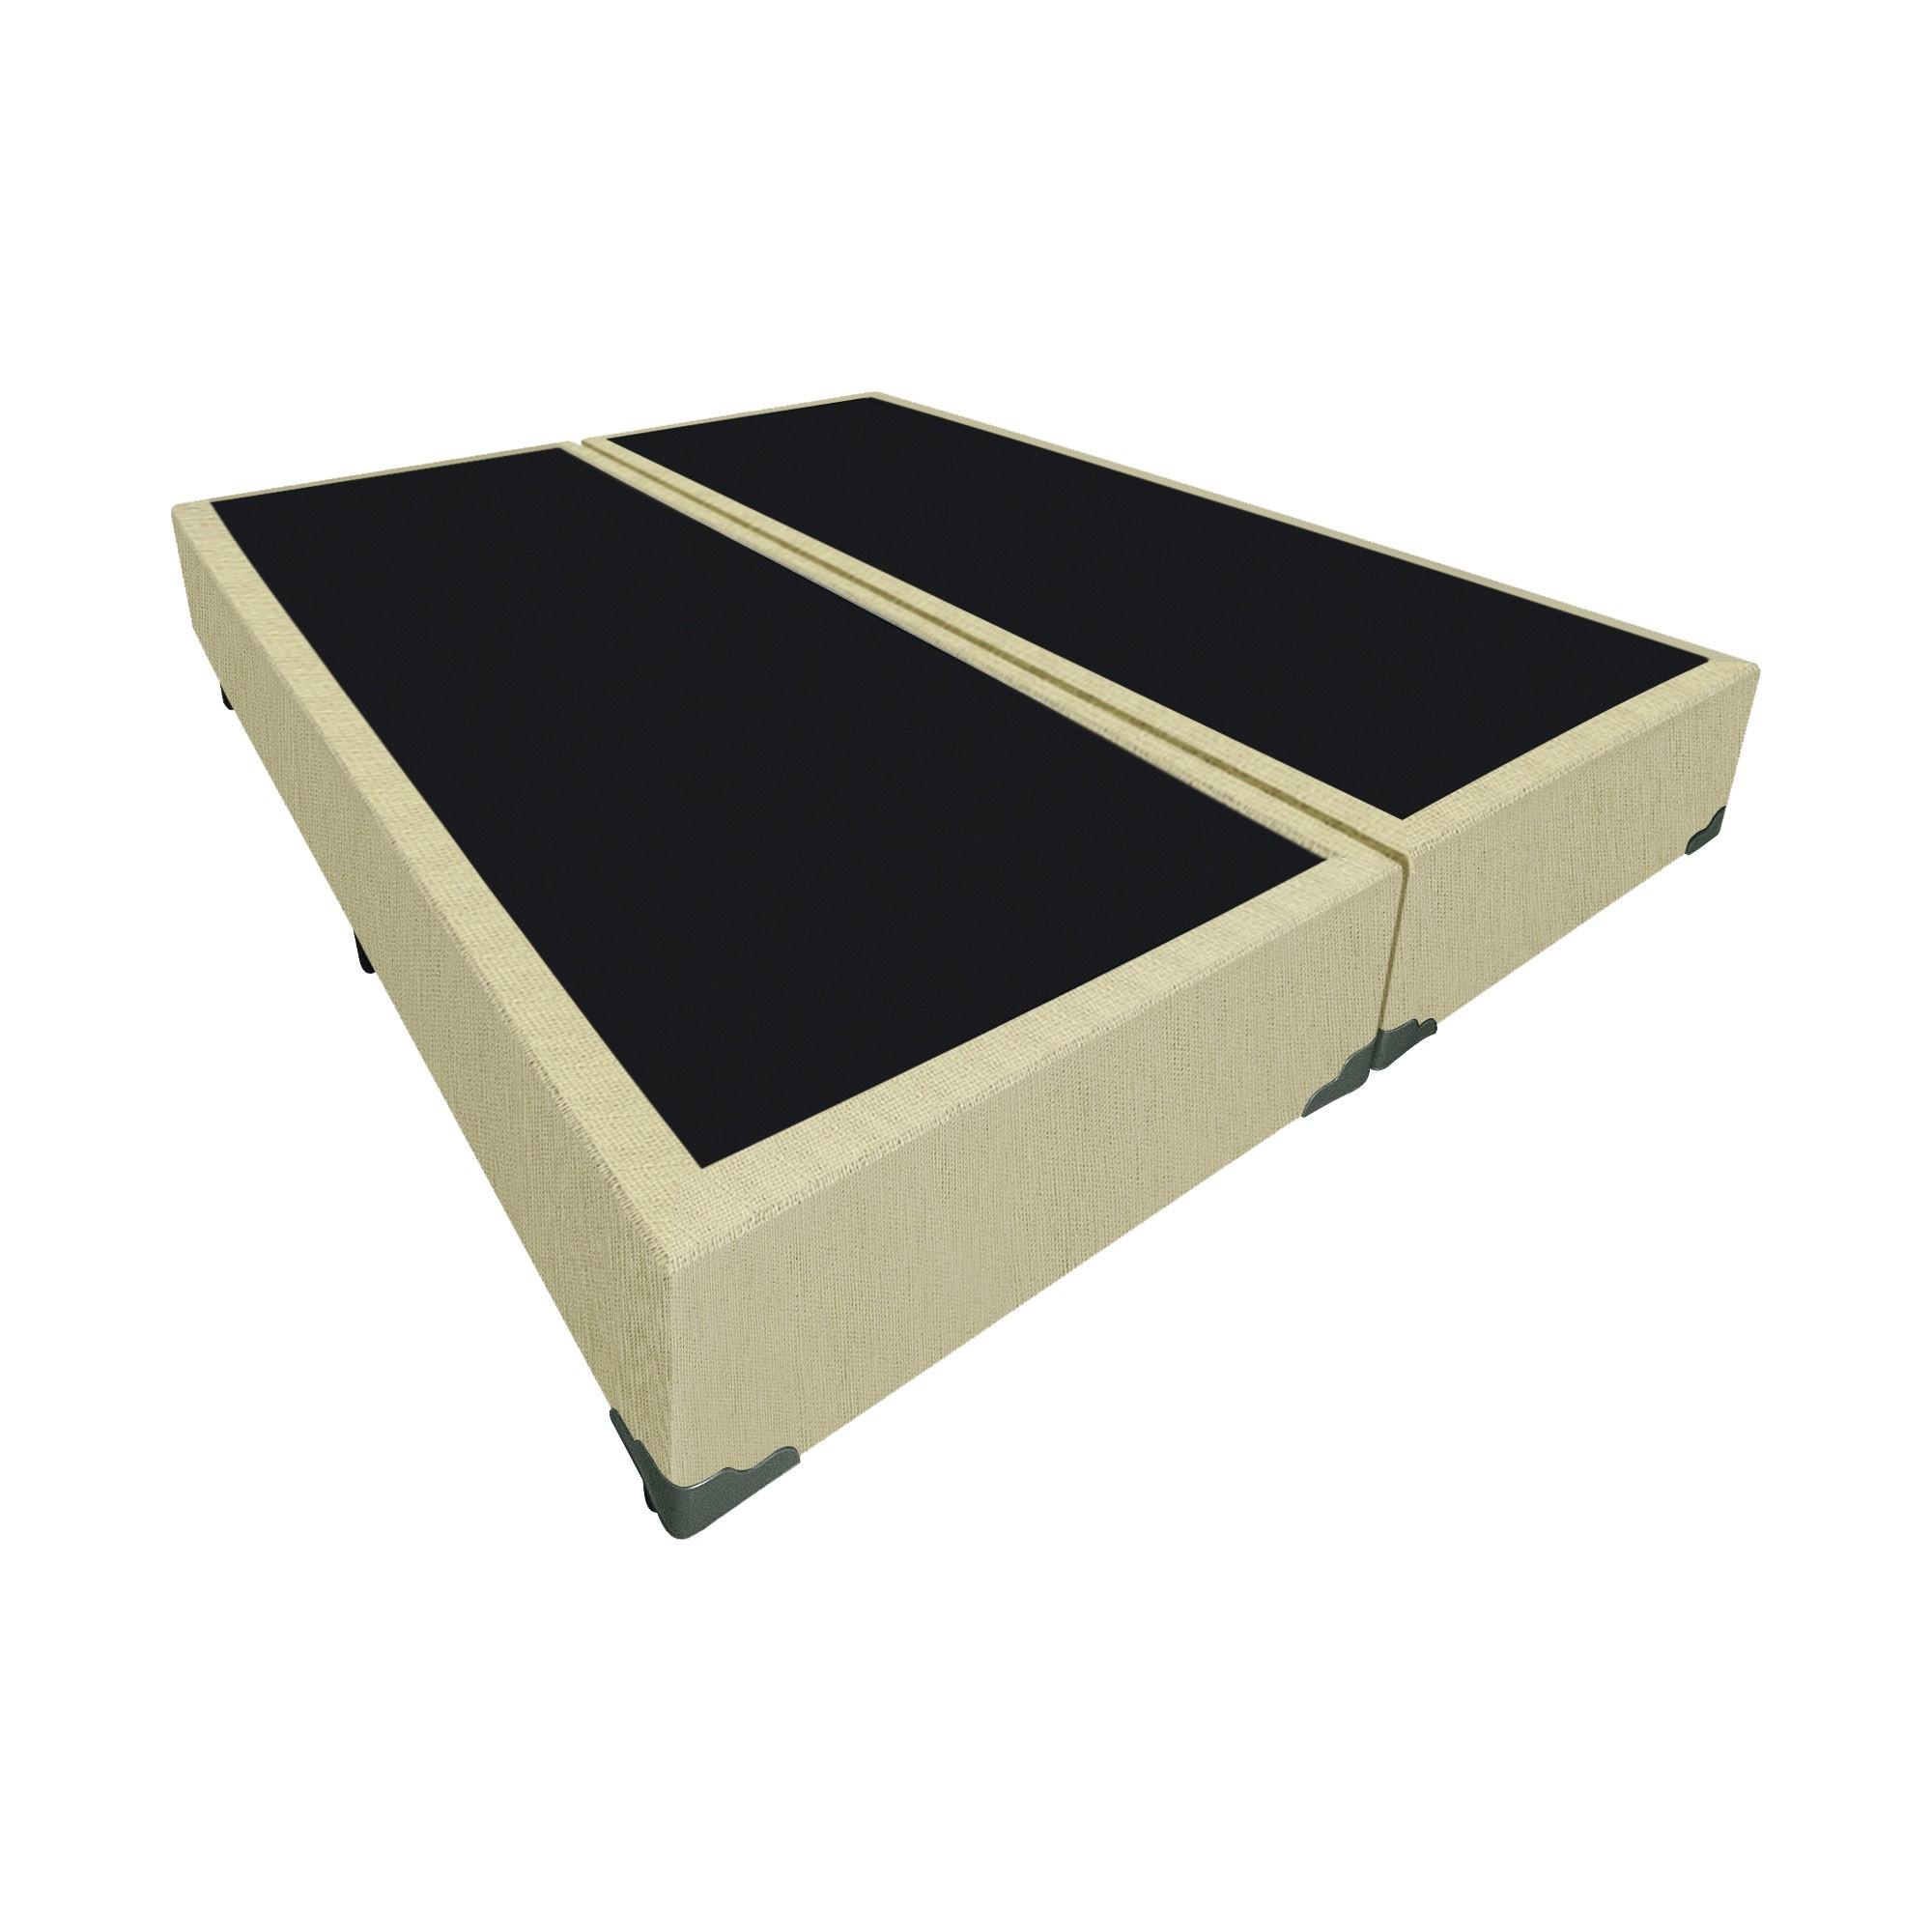 Box Tradicional Linhão Palha [King Br 180 x 200 cm]